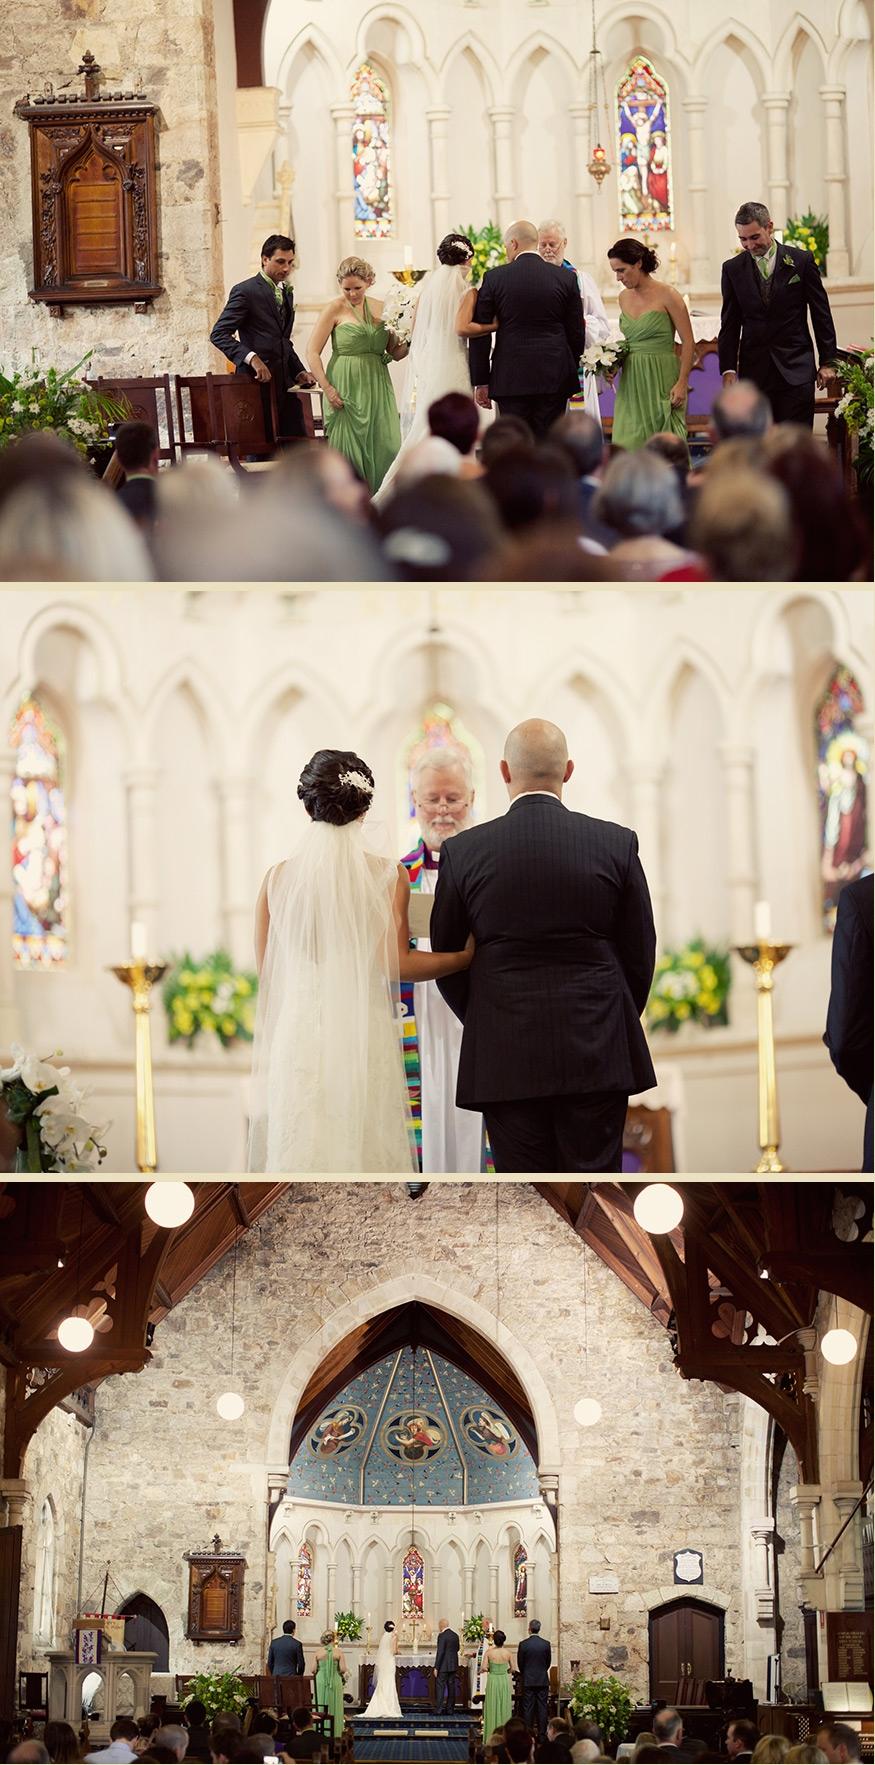 Brisbane Wedding Phoographer Blog-collage-1332894341499